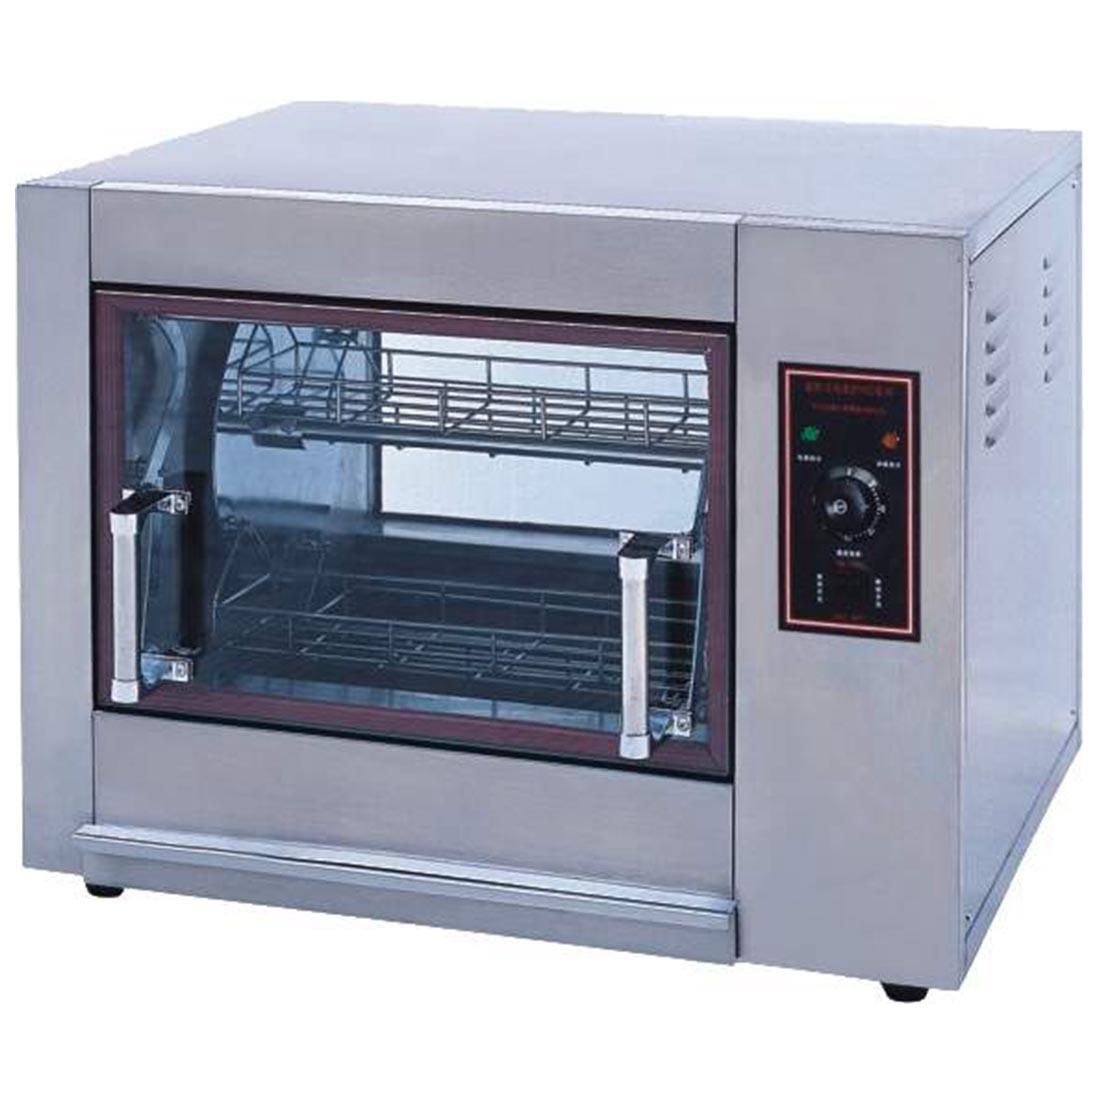 YXD-266E Compact Basket Rotisserie